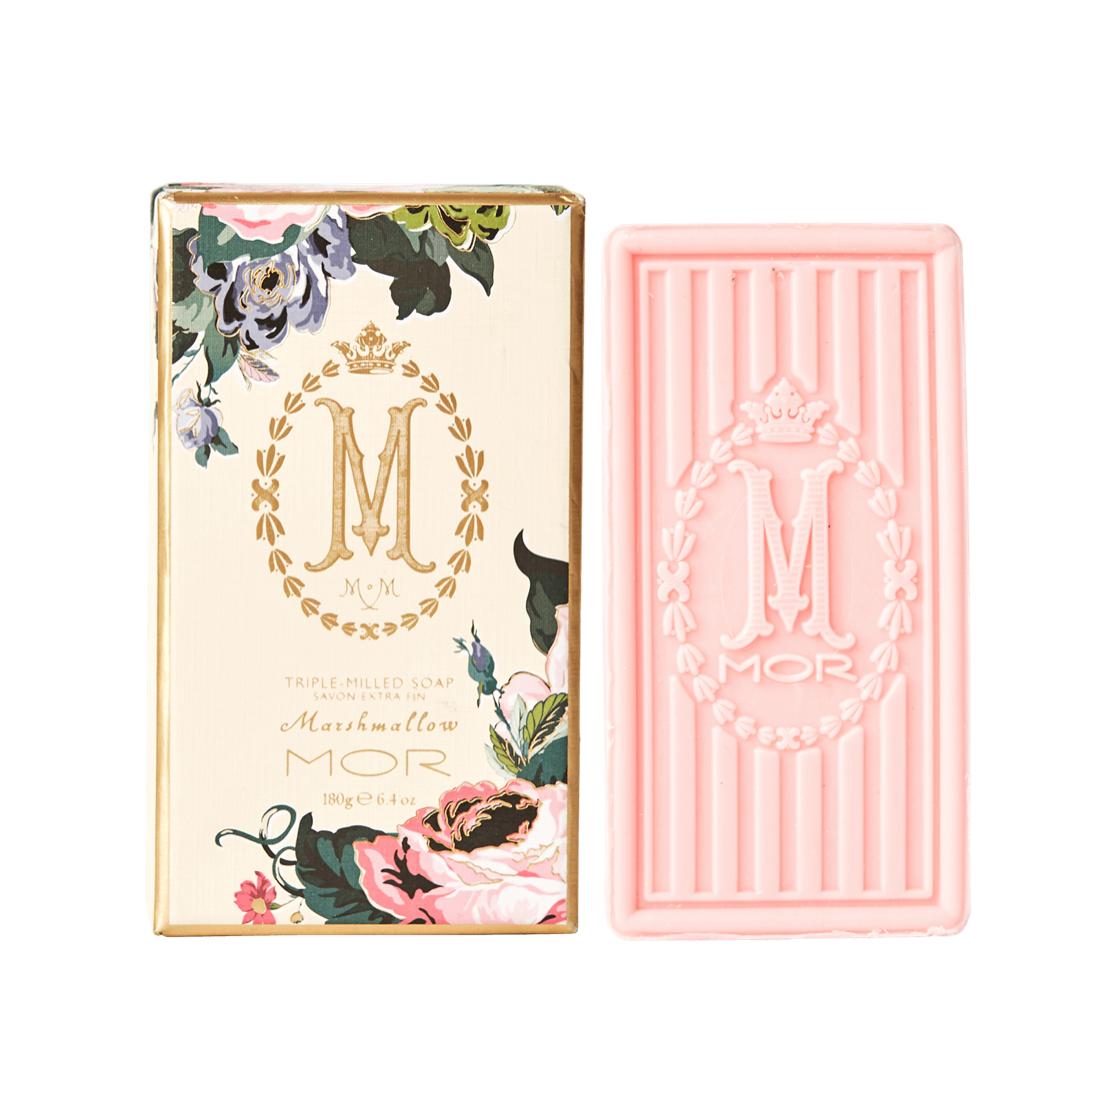 MARSHMALLOW TRIPLE-MILLED SOAP